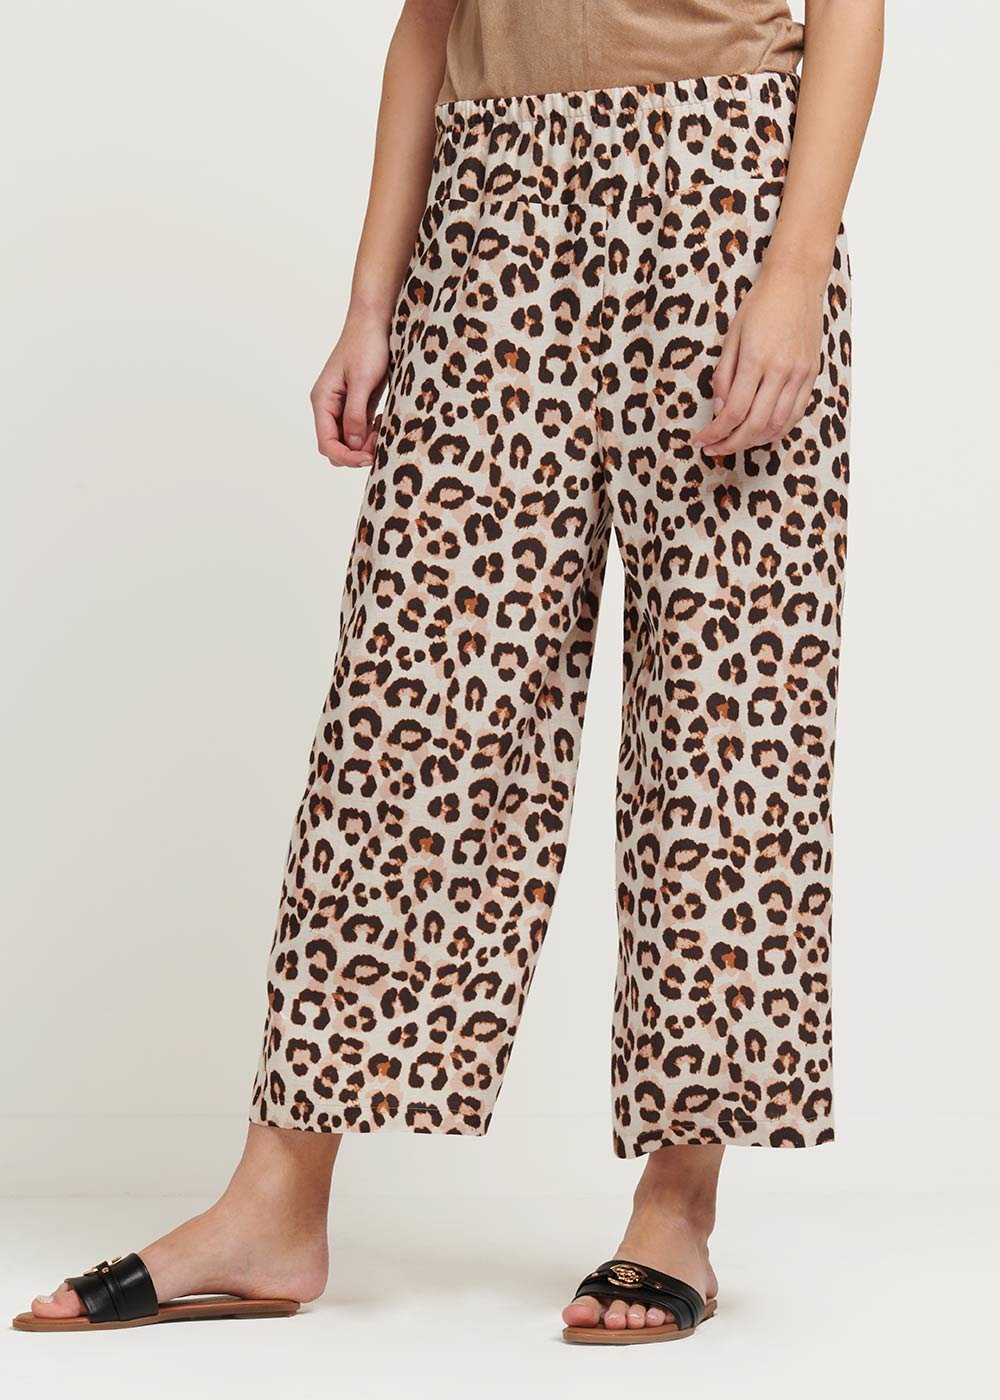 Megan capri pants with spotted print - L.beige\ Coccio Fantasia - Woman